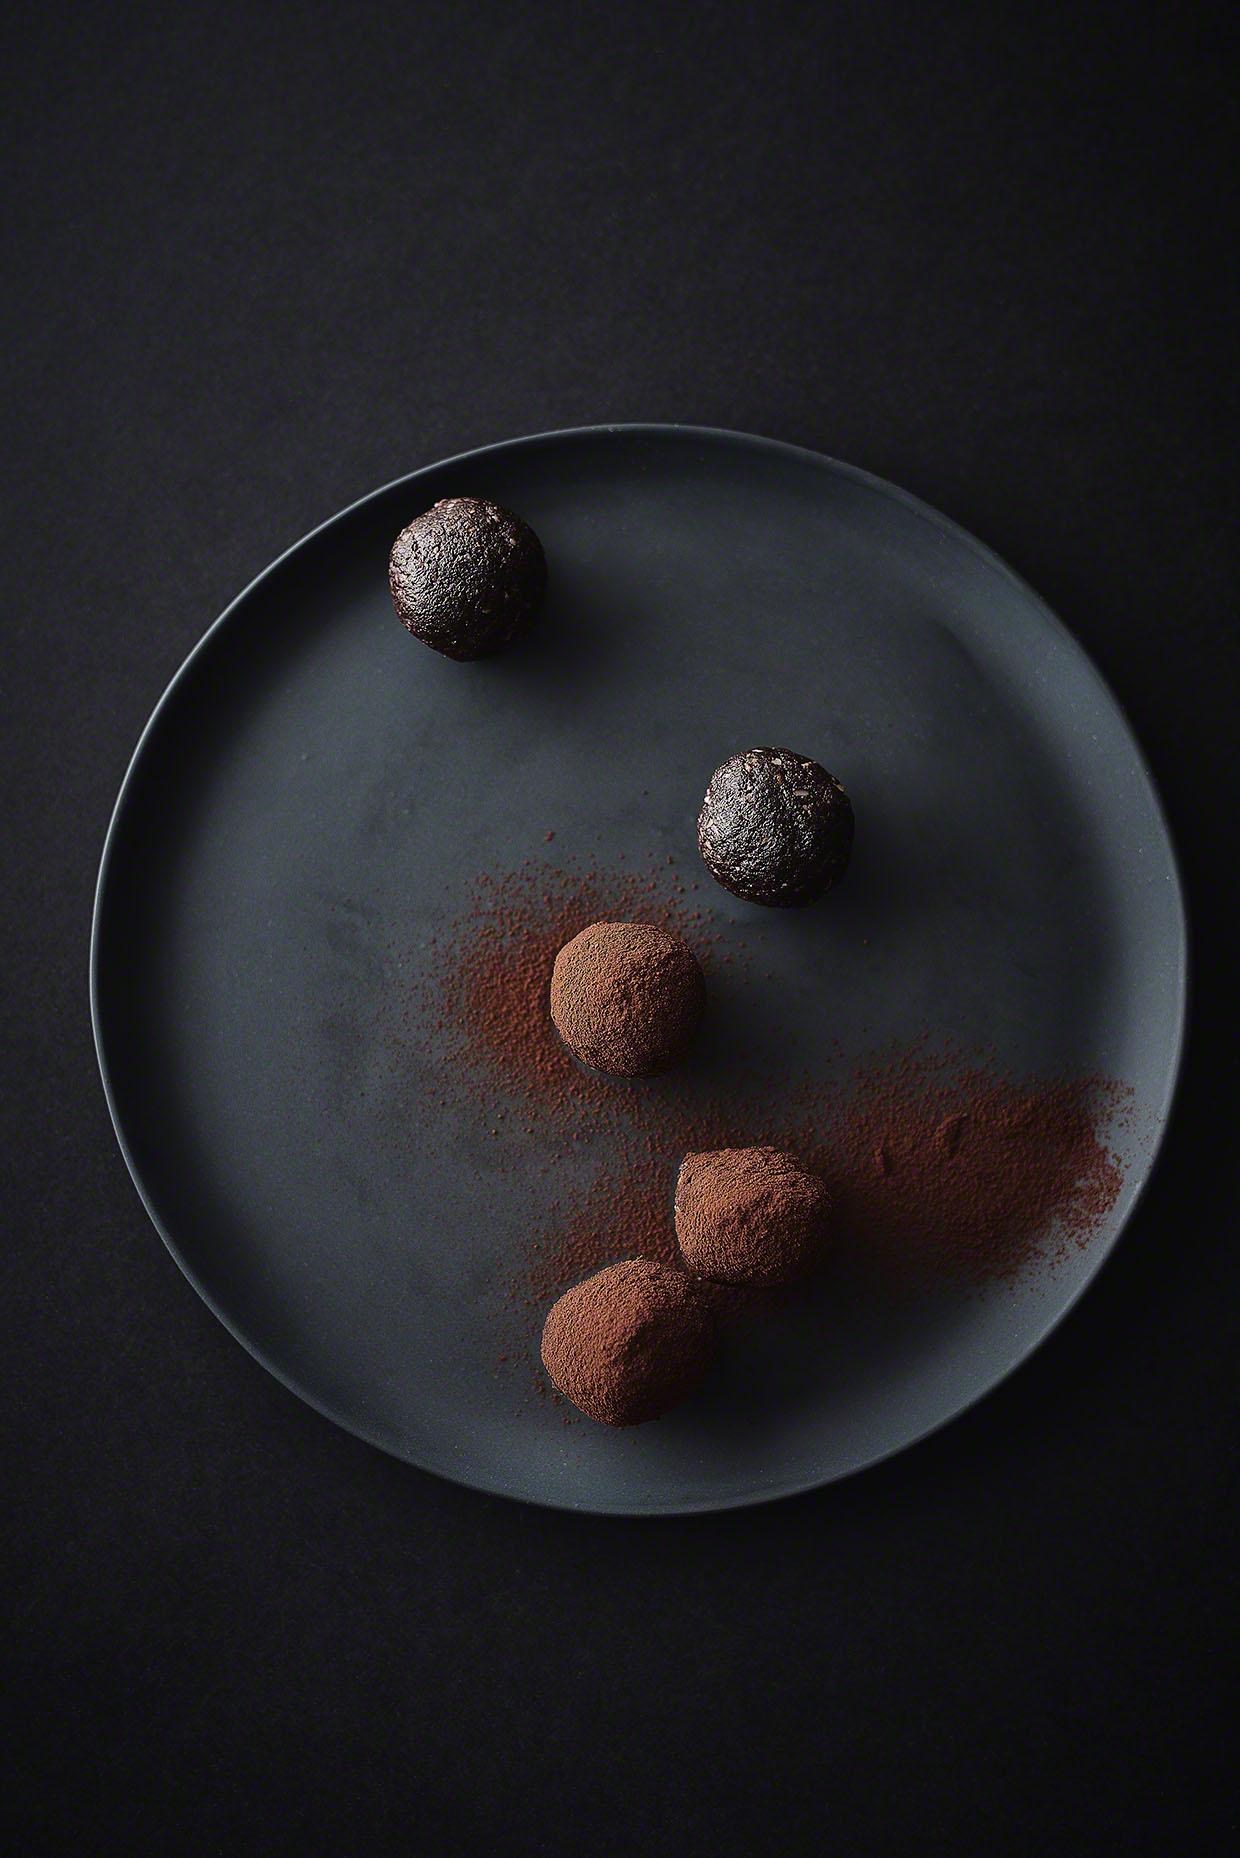 Gesunde Schoko-Mandel-Energiebällchen nach Rezept von Deliciously Ella - Foodfotos Energyballs neon-fotografie